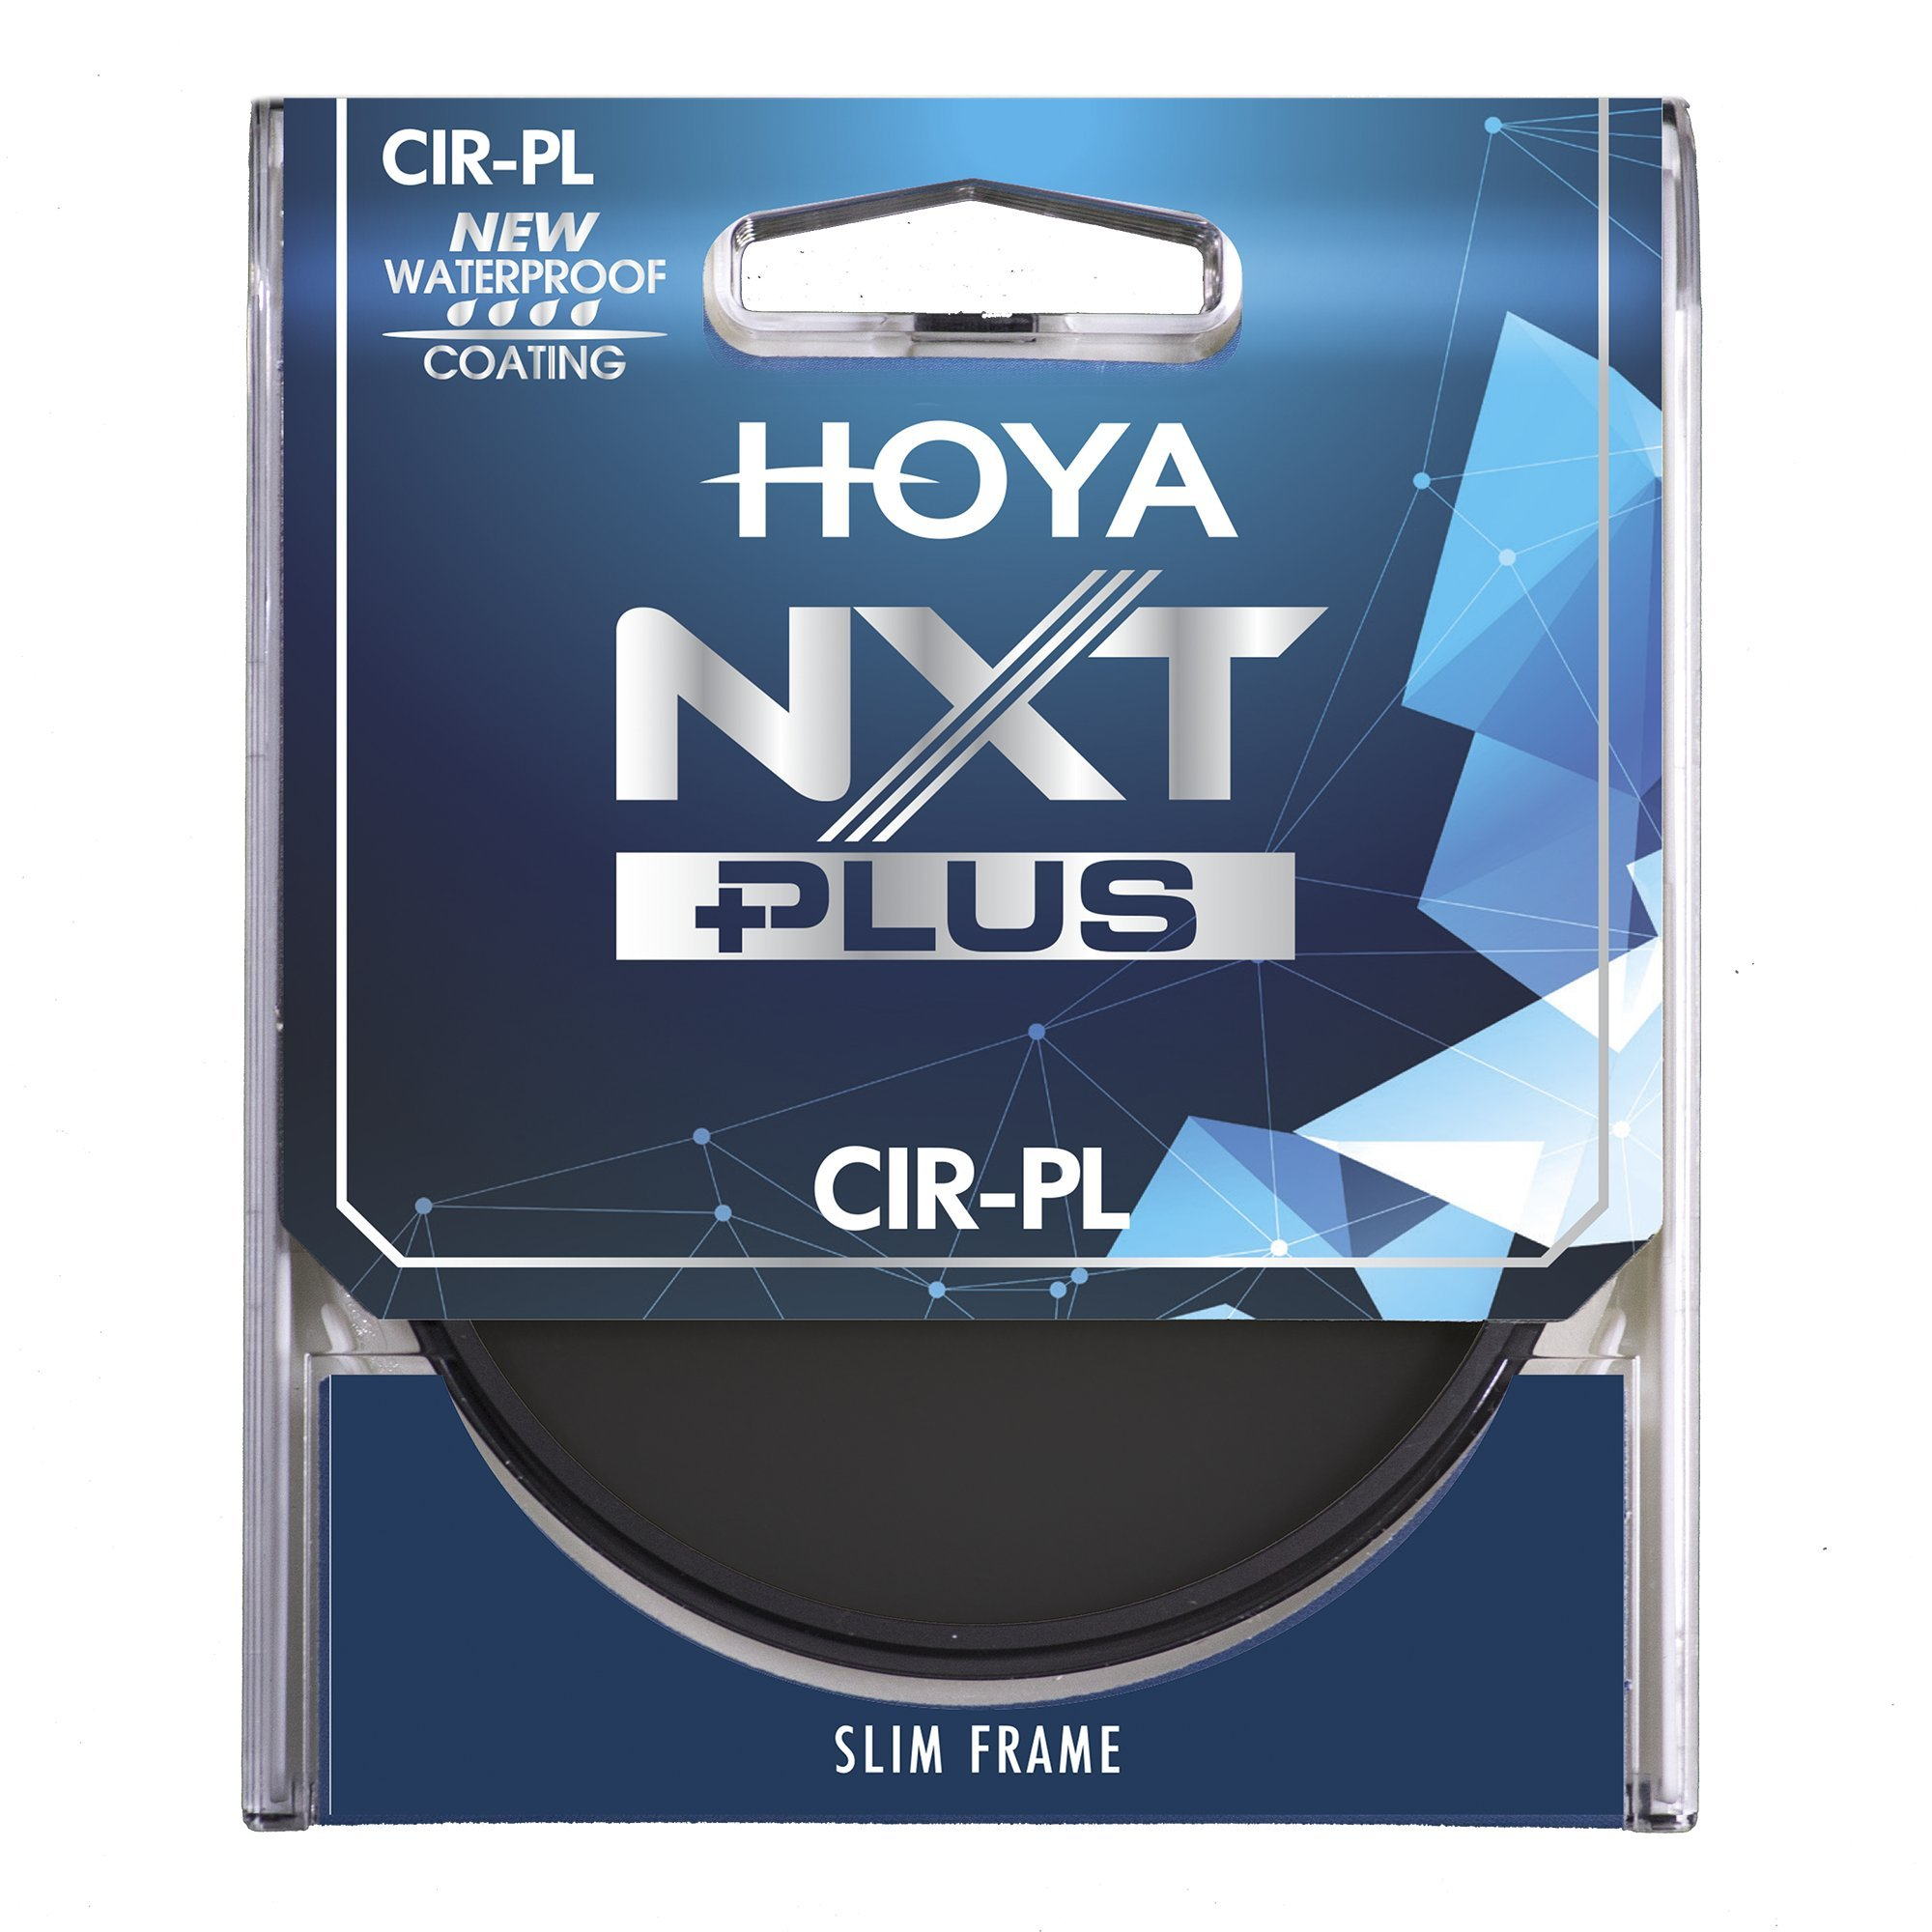 Hoya 77mm NXT Plus Circular Polarizer Slim Frame Glass Filter by Hoya